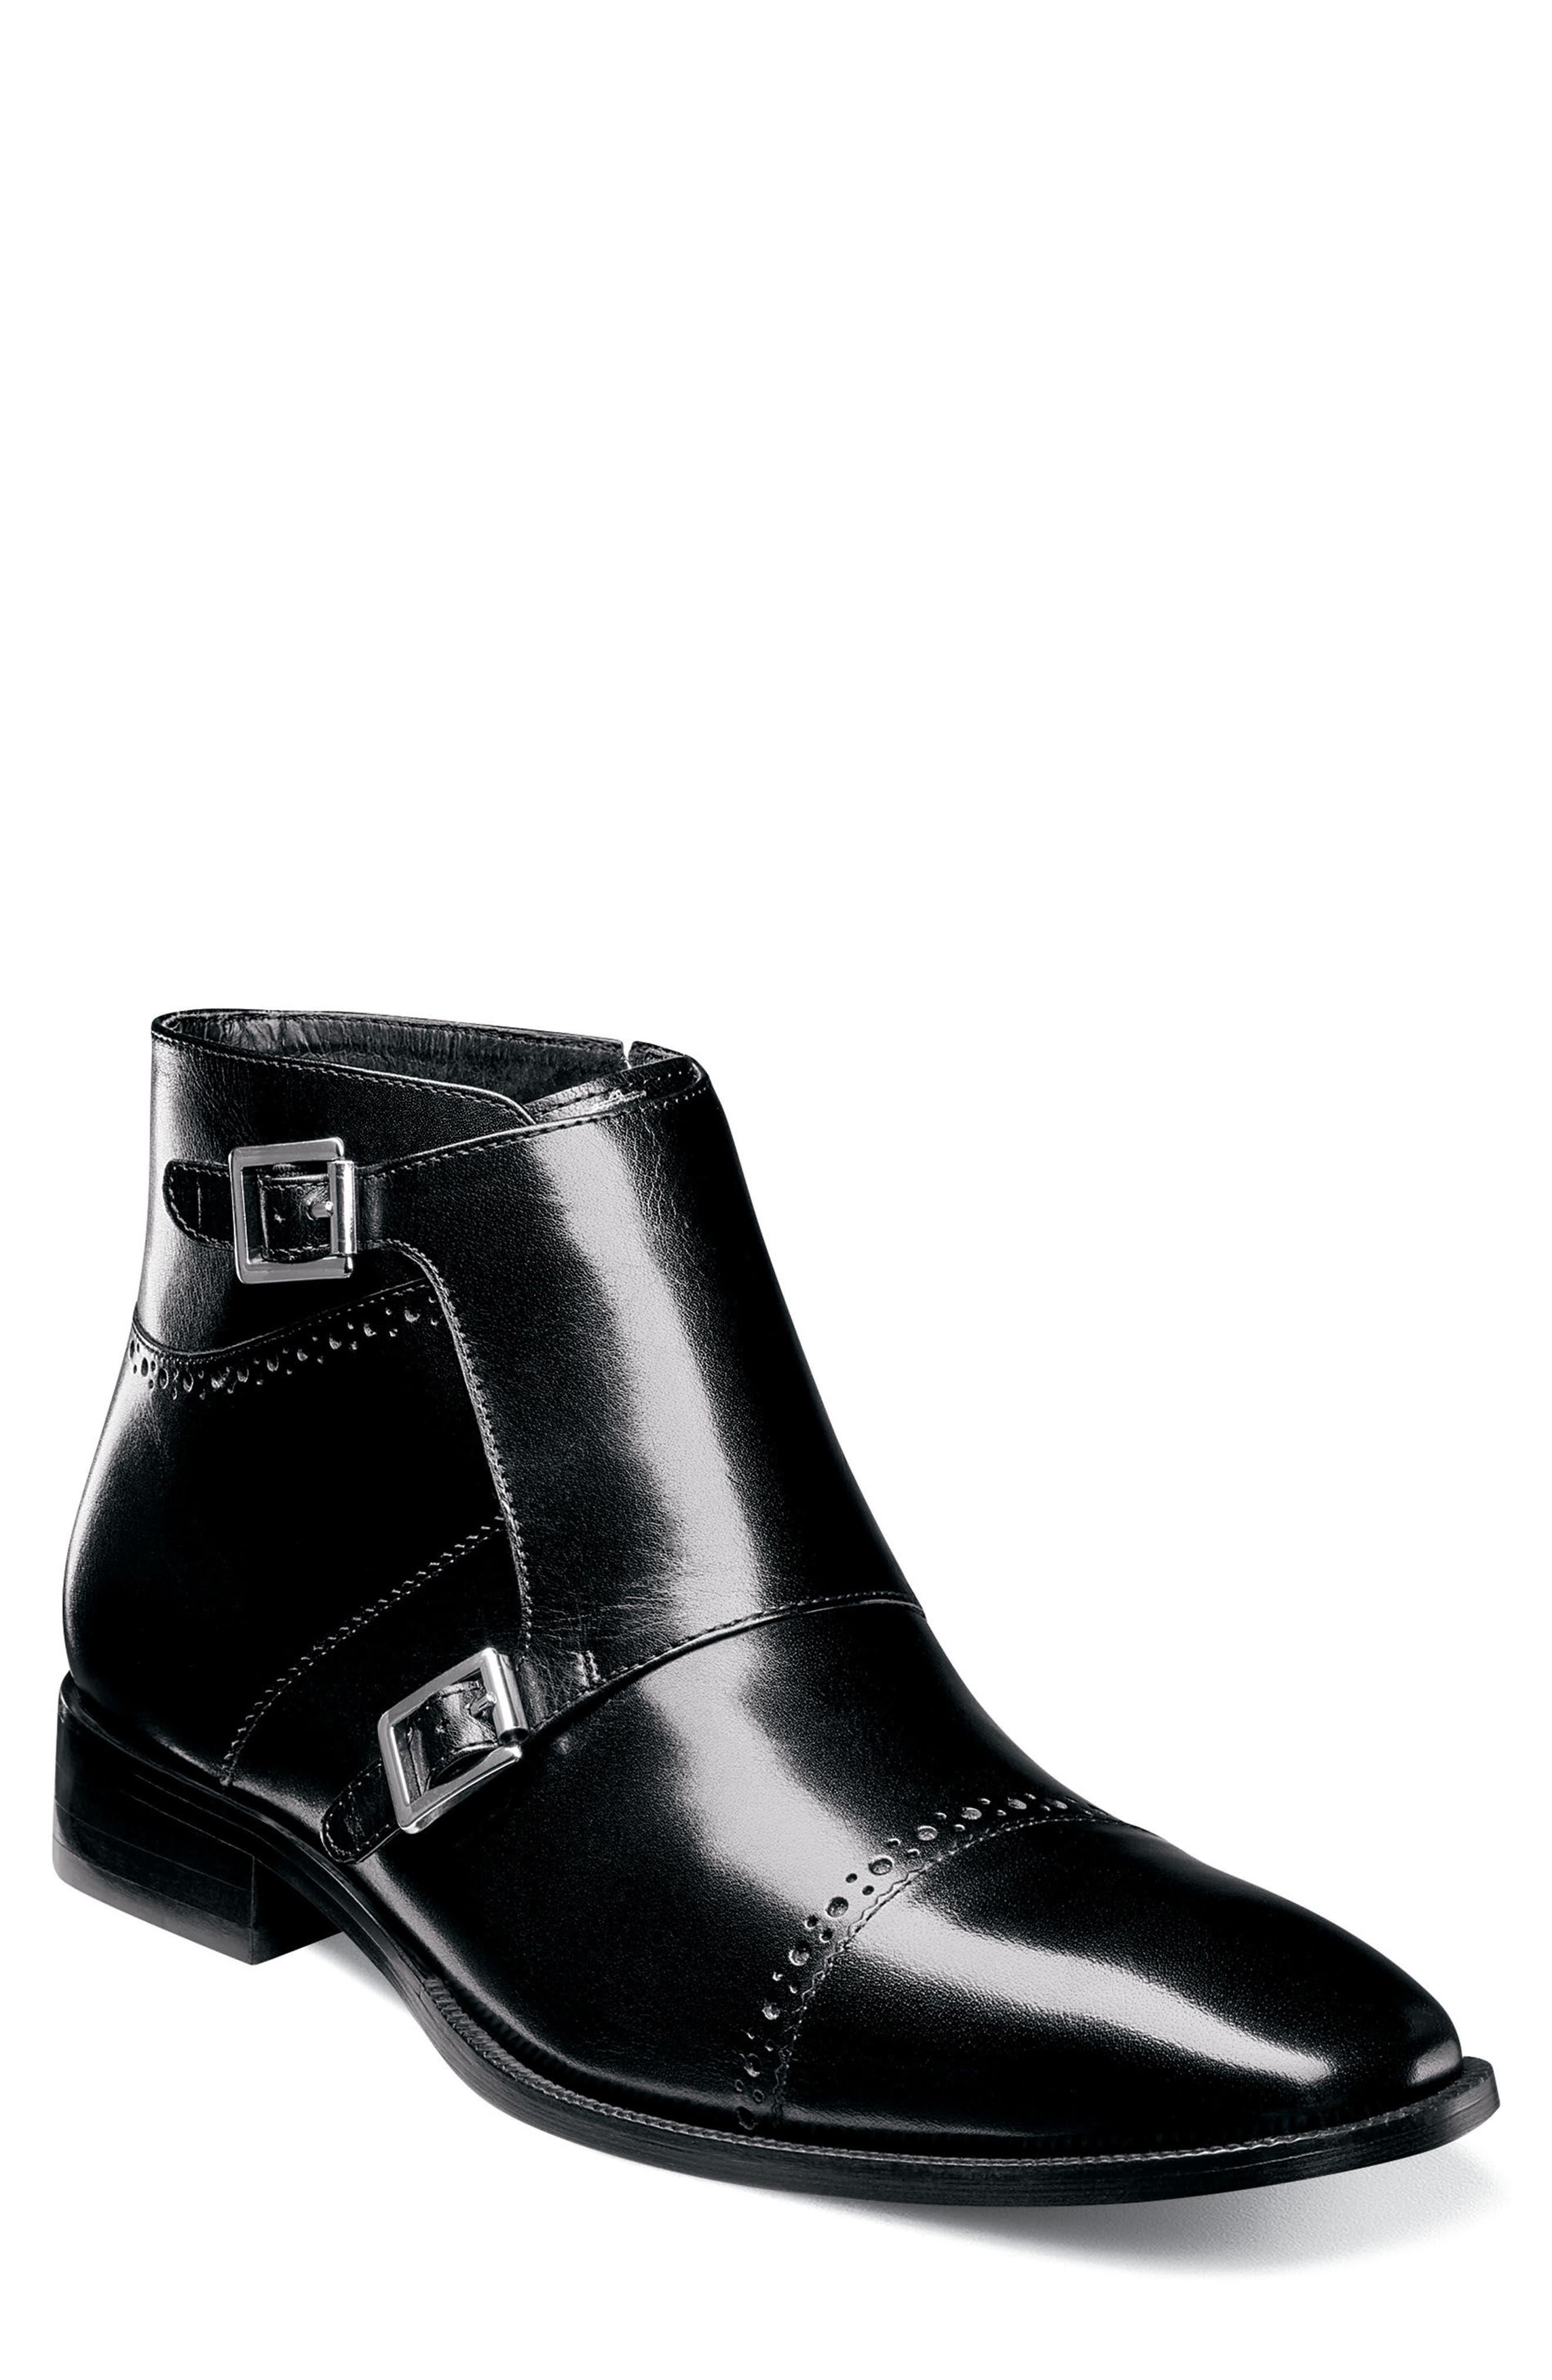 Kason Double Monk Strap Boot,                             Main thumbnail 1, color,                             Black Leather